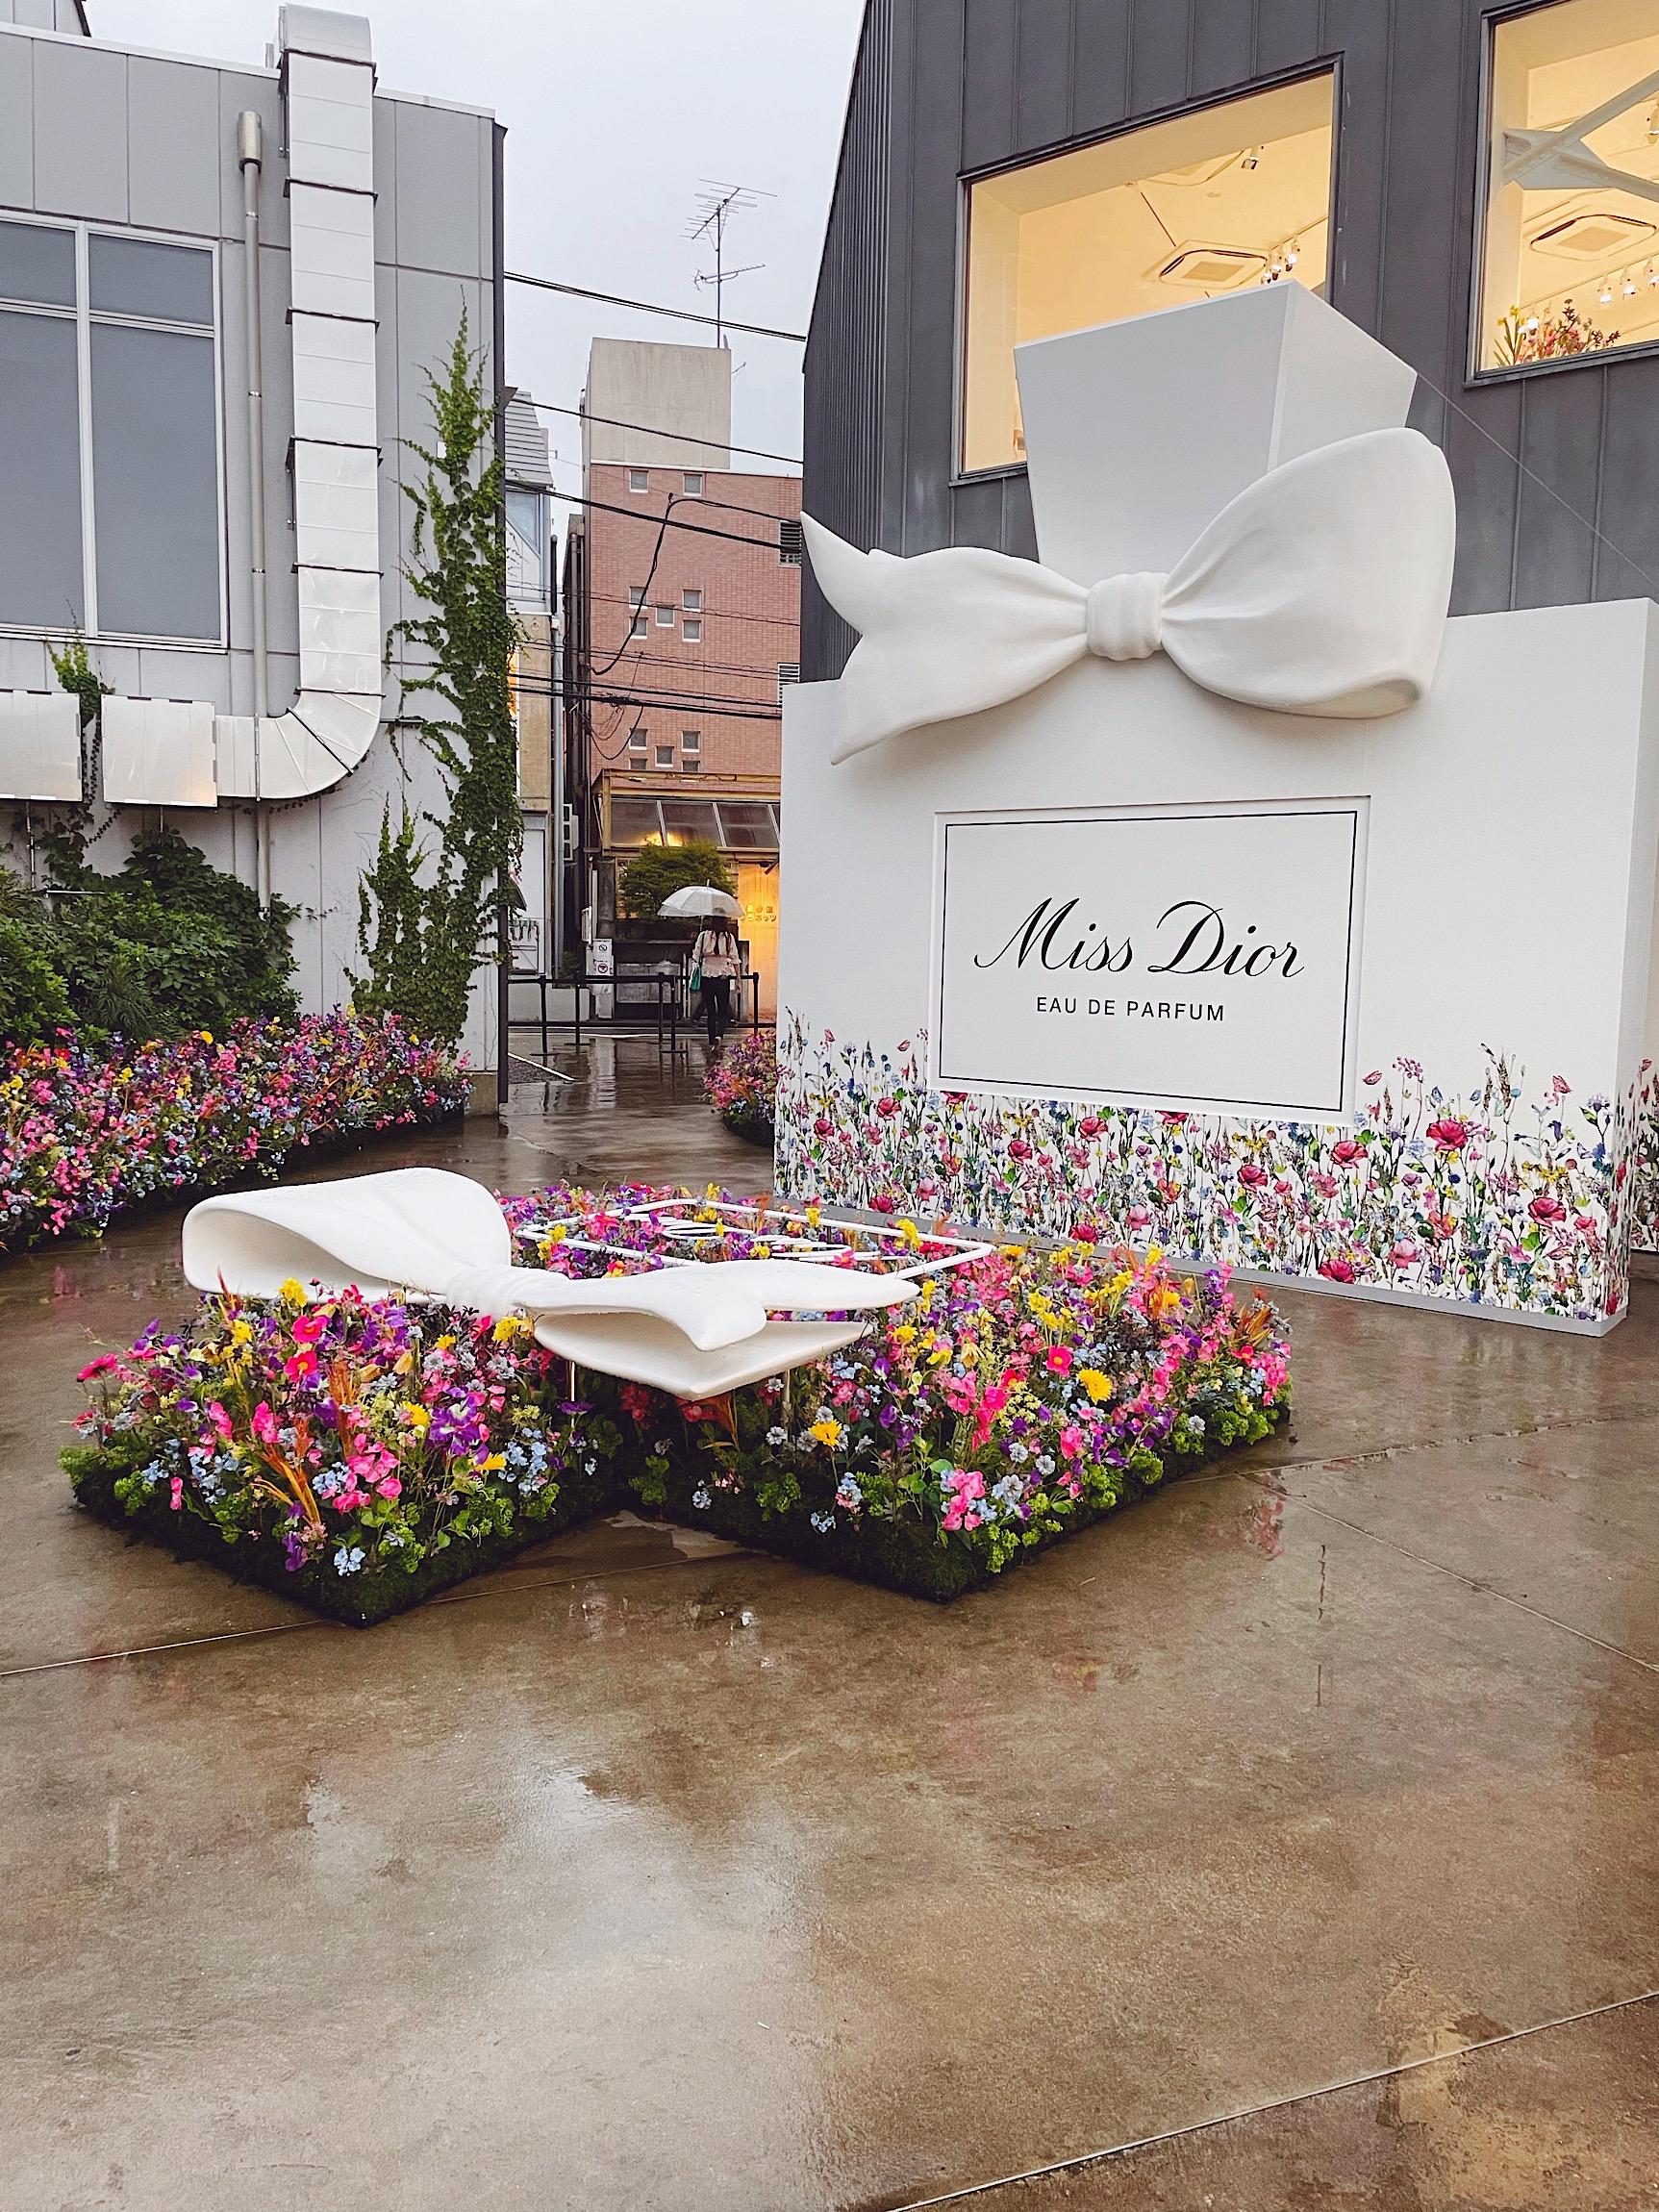 Dior(ディオール)のアートイベント「ミス ディオール エキシビション」